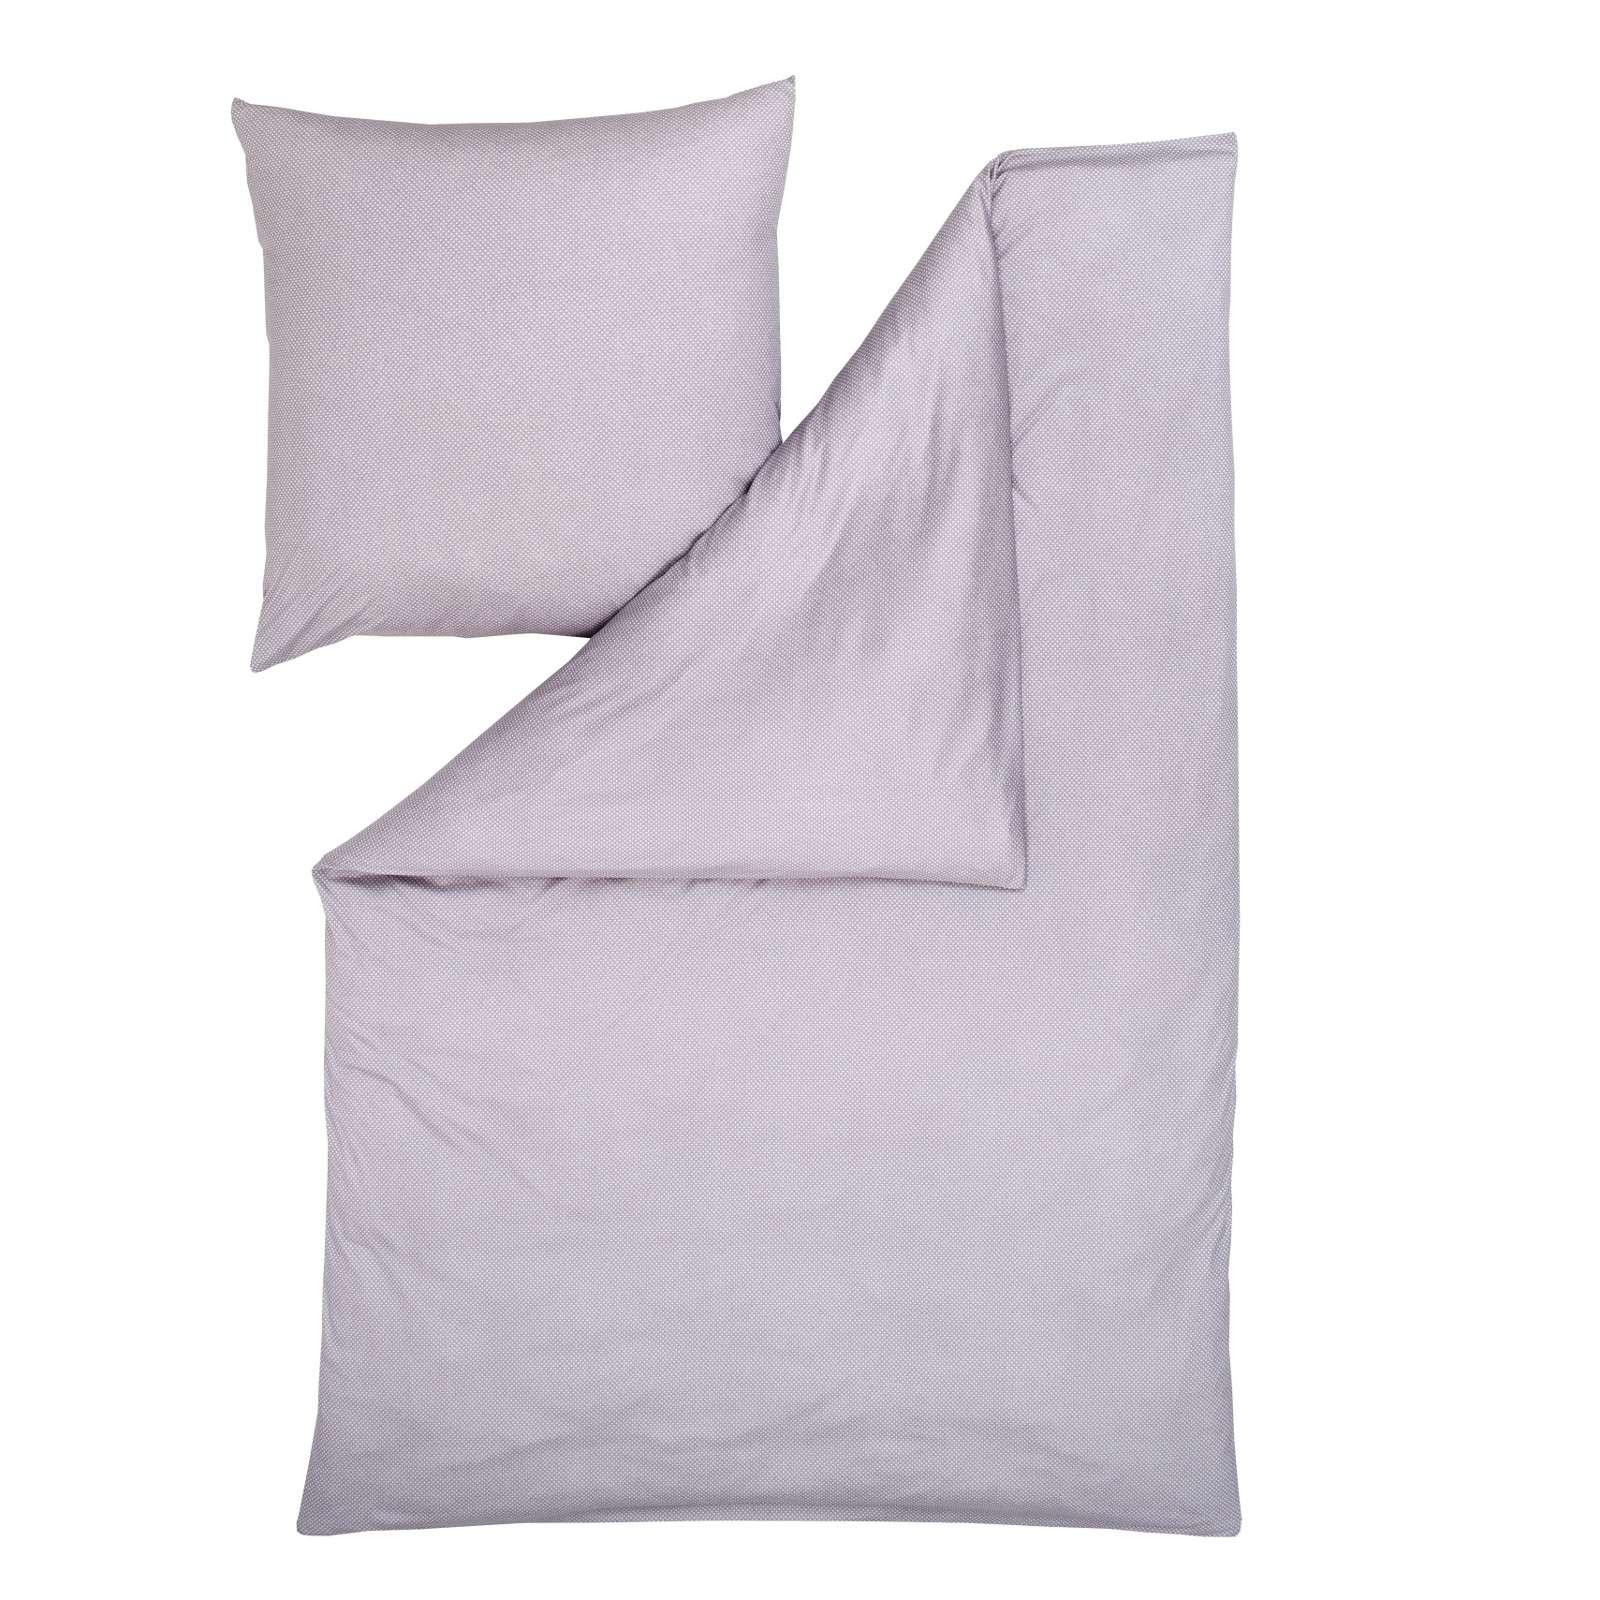 Estella Mako Interlock Jersey Bettwäsche Tamar 135x200 Cm Lavendel